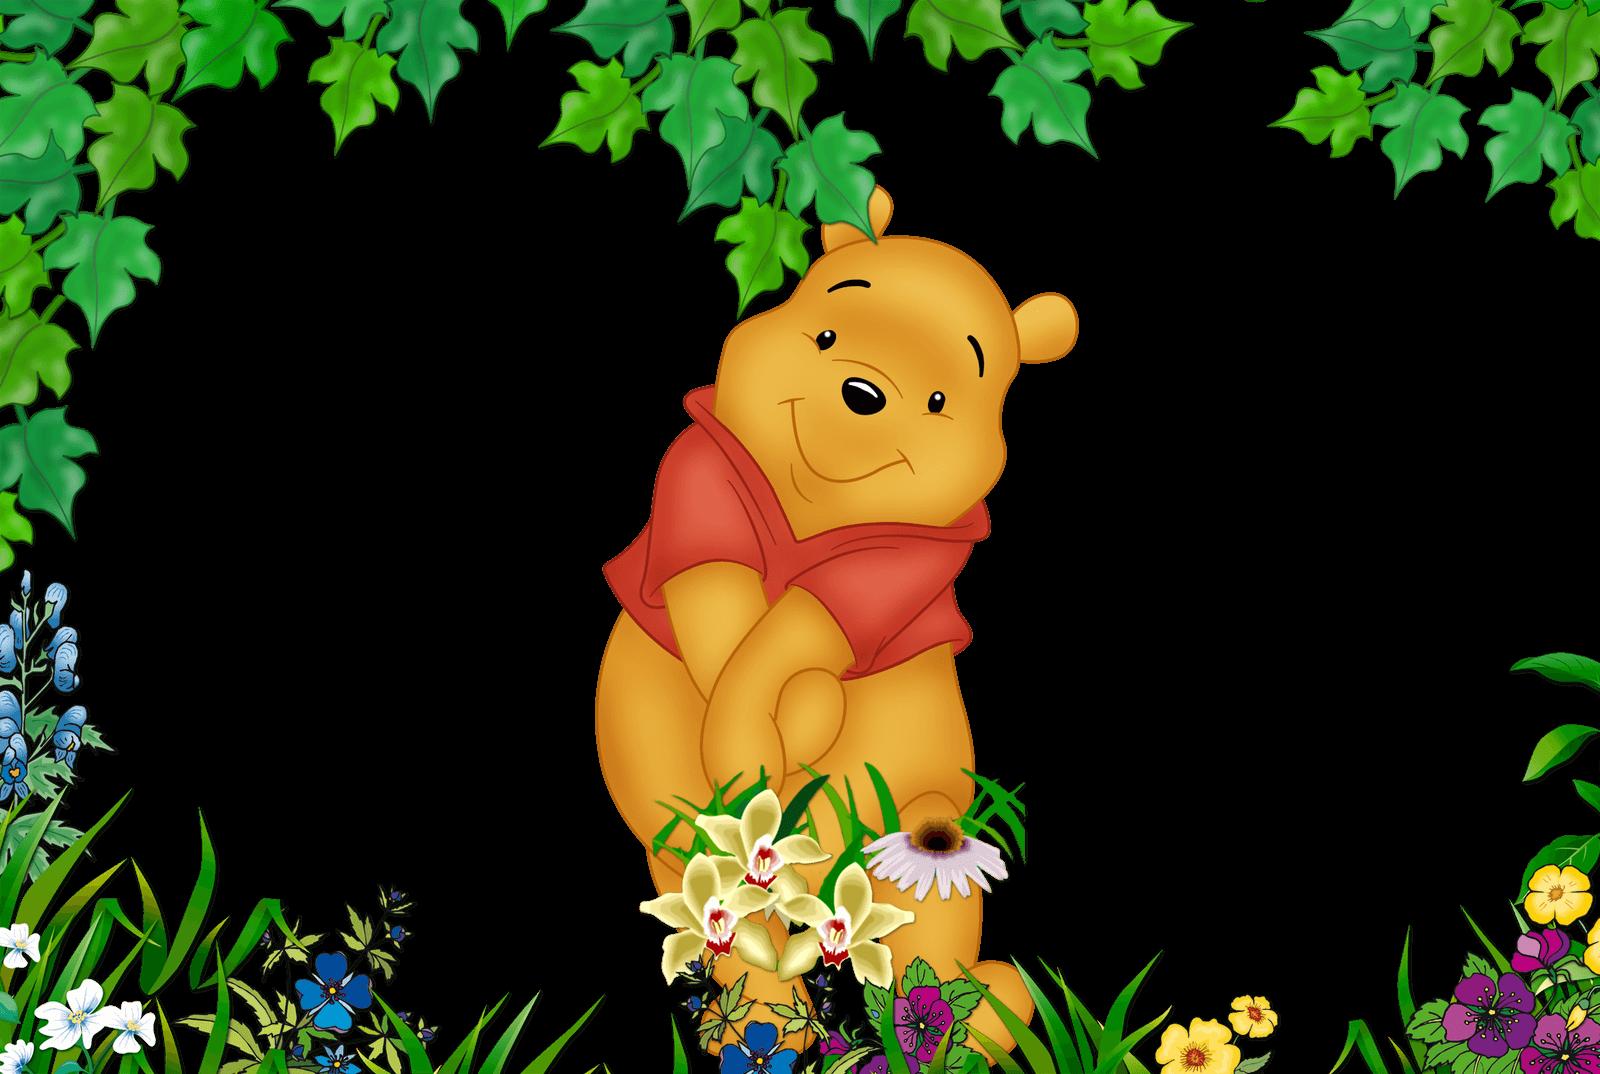 Marco De Foto Winnie The Pooh c - Marco De Foto Winnie The Pooh c